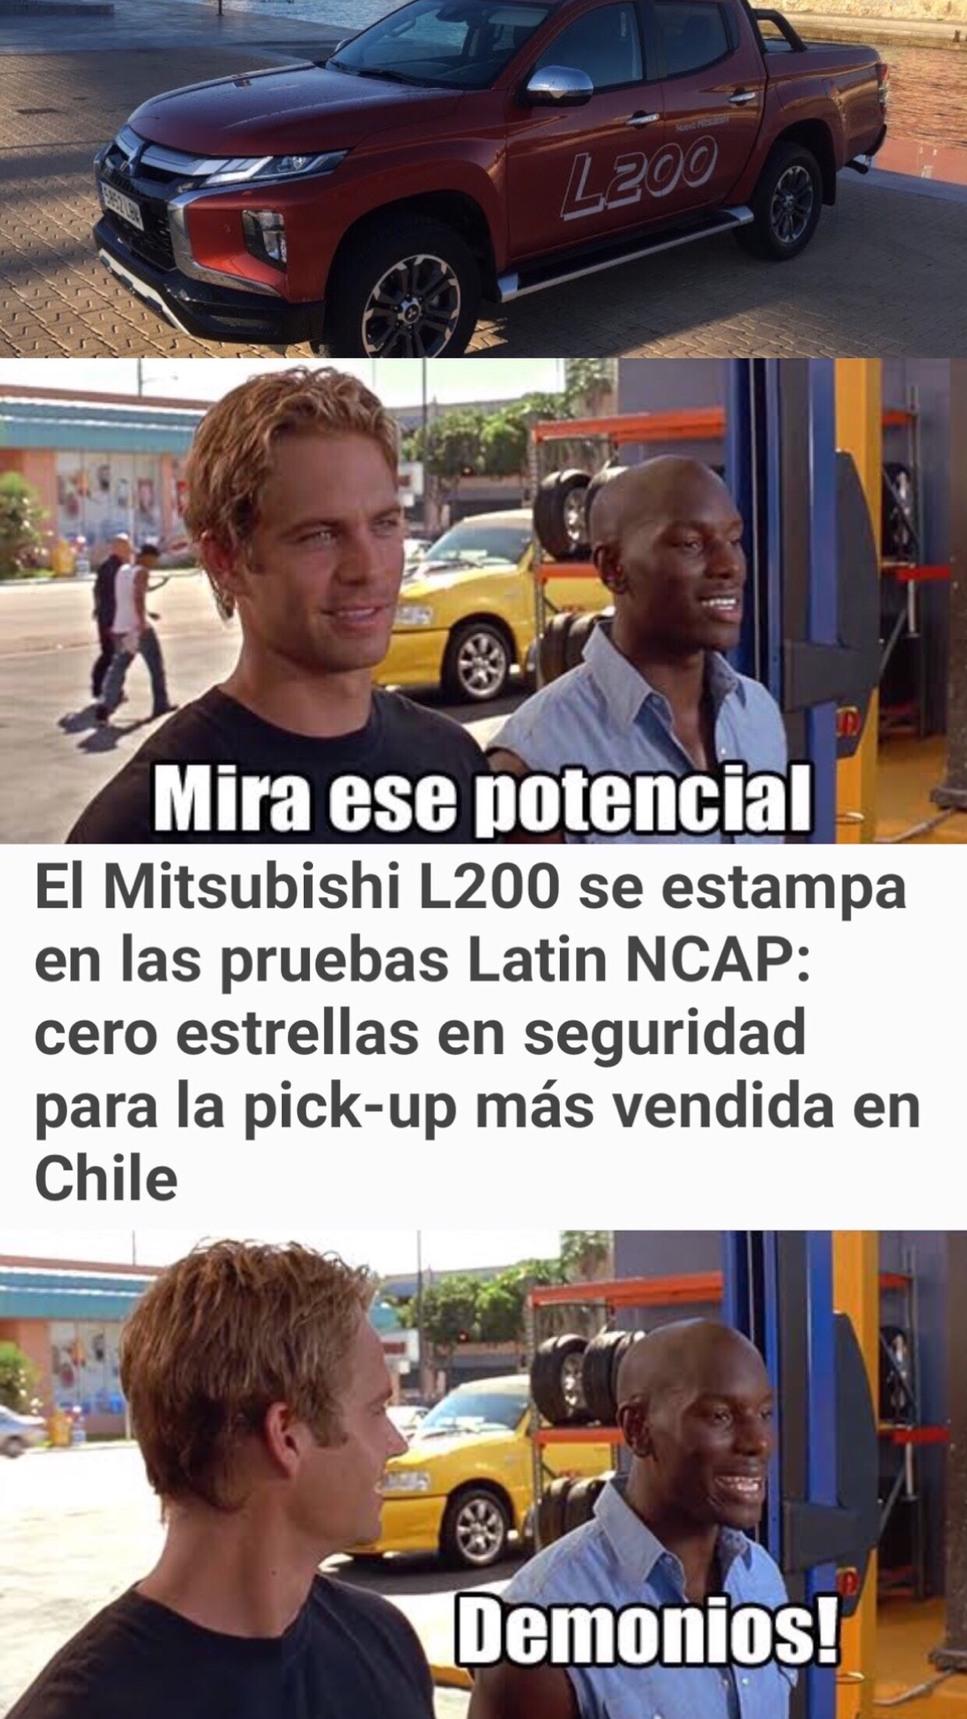 Mitsubishi Cero Estrellas - meme